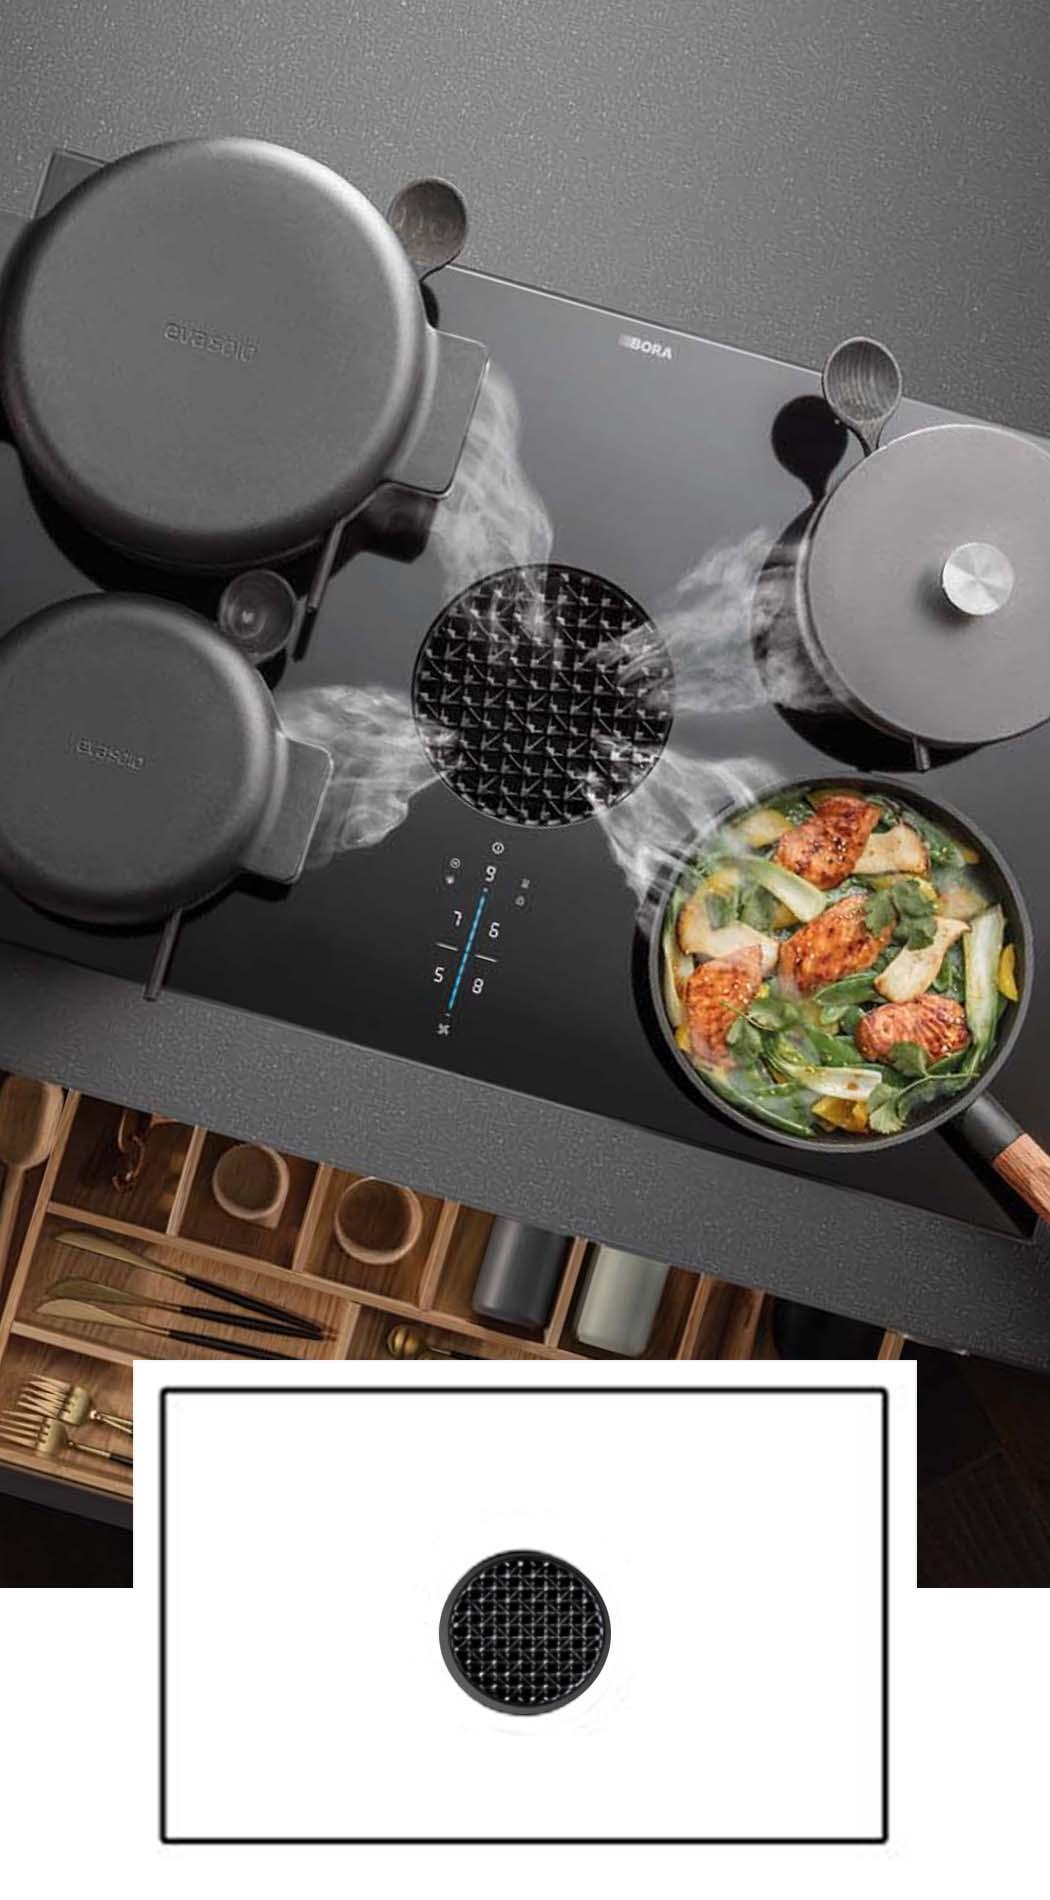 BORA X Pure - BORA kookplaat met afzuiging, ASWA Keukens